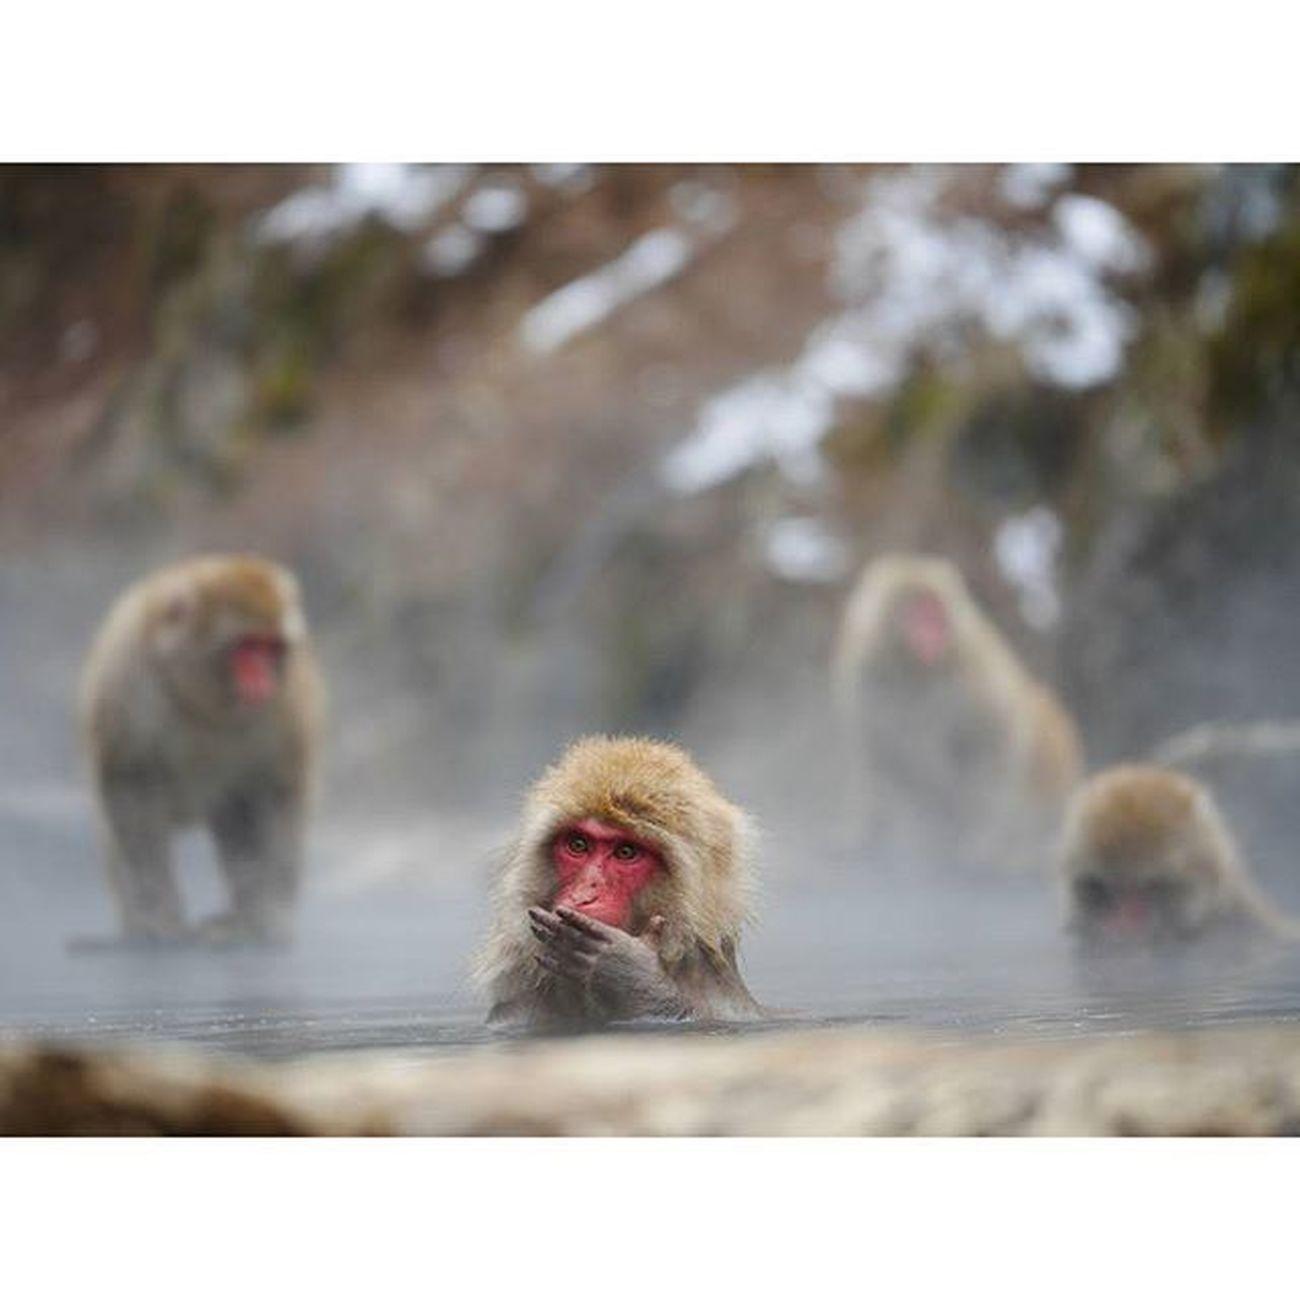 Jigokundani Monkey Park Liveauthentic Travelphotography Peoplescreative Wildlifephotography Japan TravelJapan Jigokudanimonkeypark